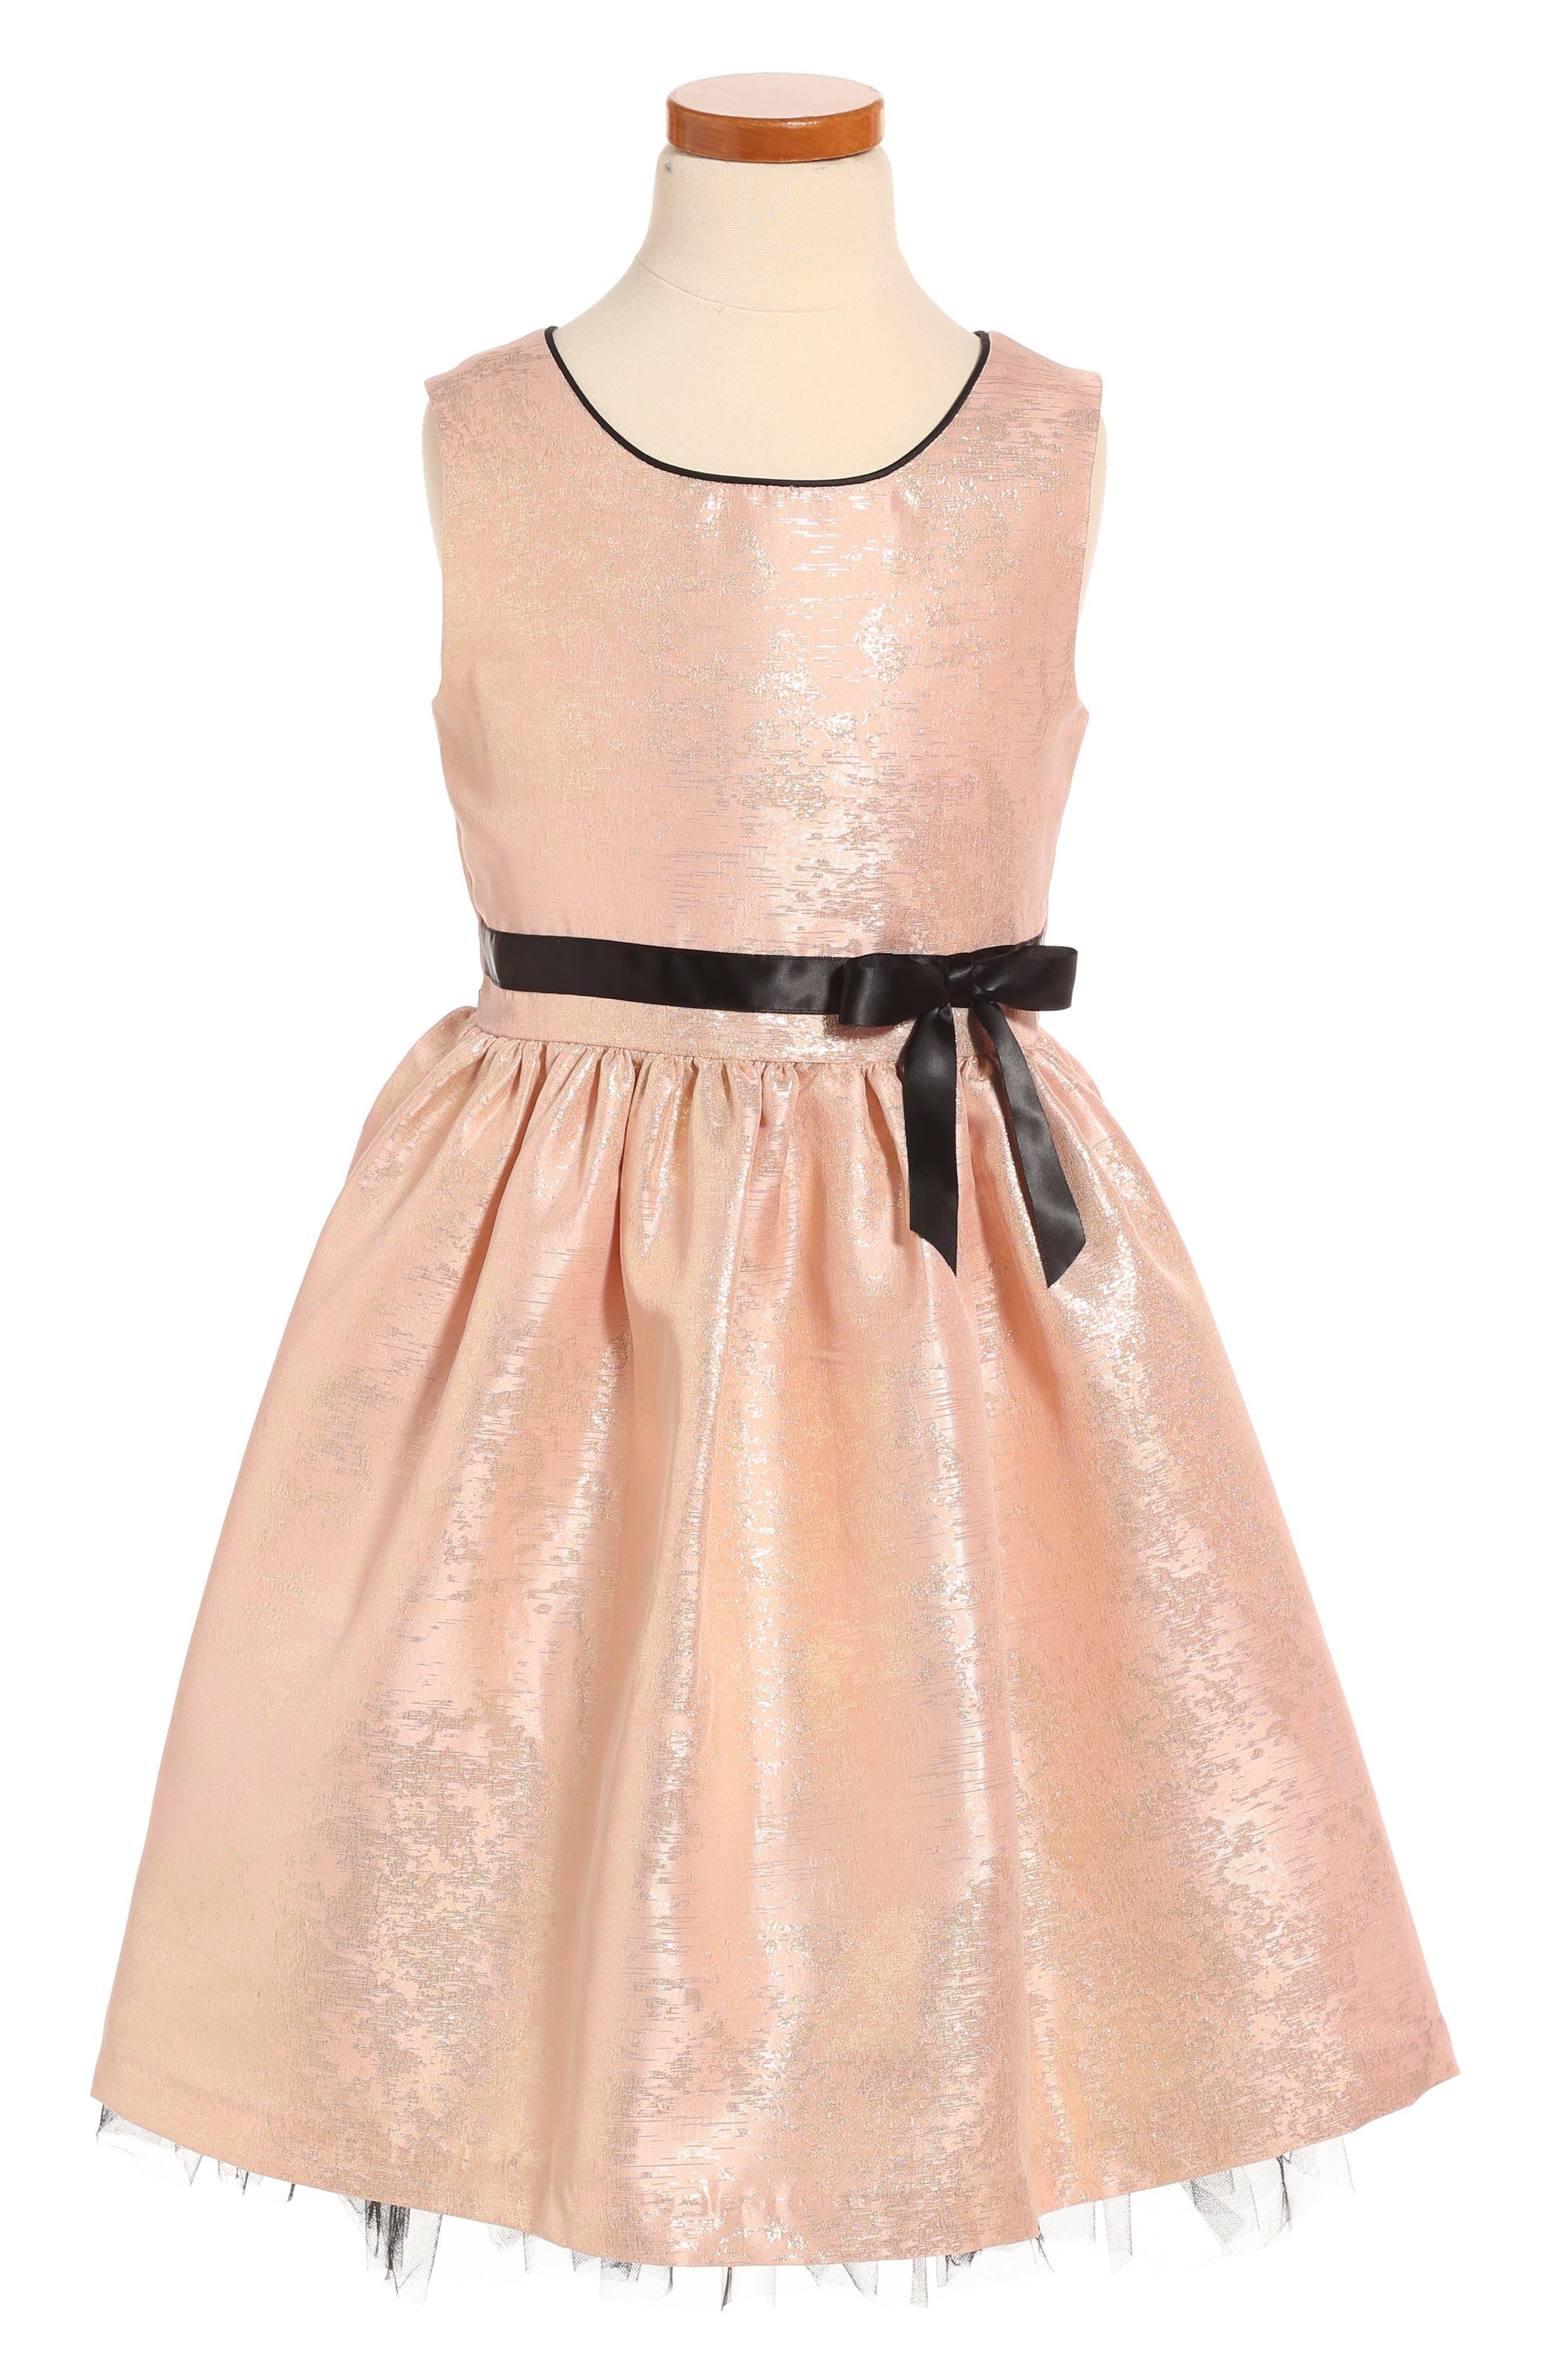 Frais Metallic Shimmer Sleeveless Dress (Toddler Girls, Little Girls & Big Girls)